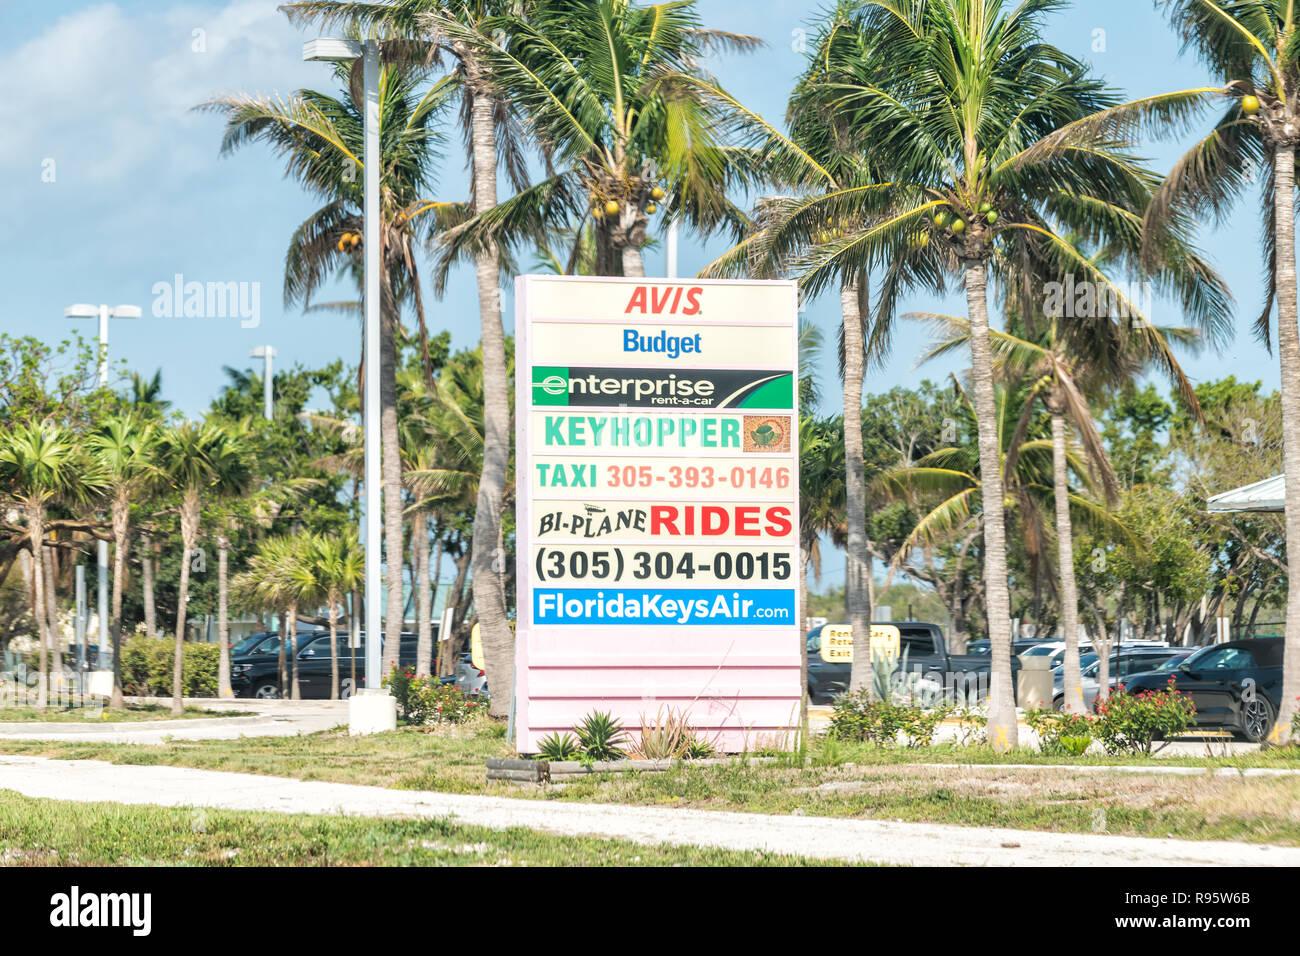 Marathon, USA - May 1, 2018: Road sign, billboard for Avis, Budget, Enterprise, keyhopper car rental, taxi, bi-plane rides, tourist activities in Flor - Stock Image